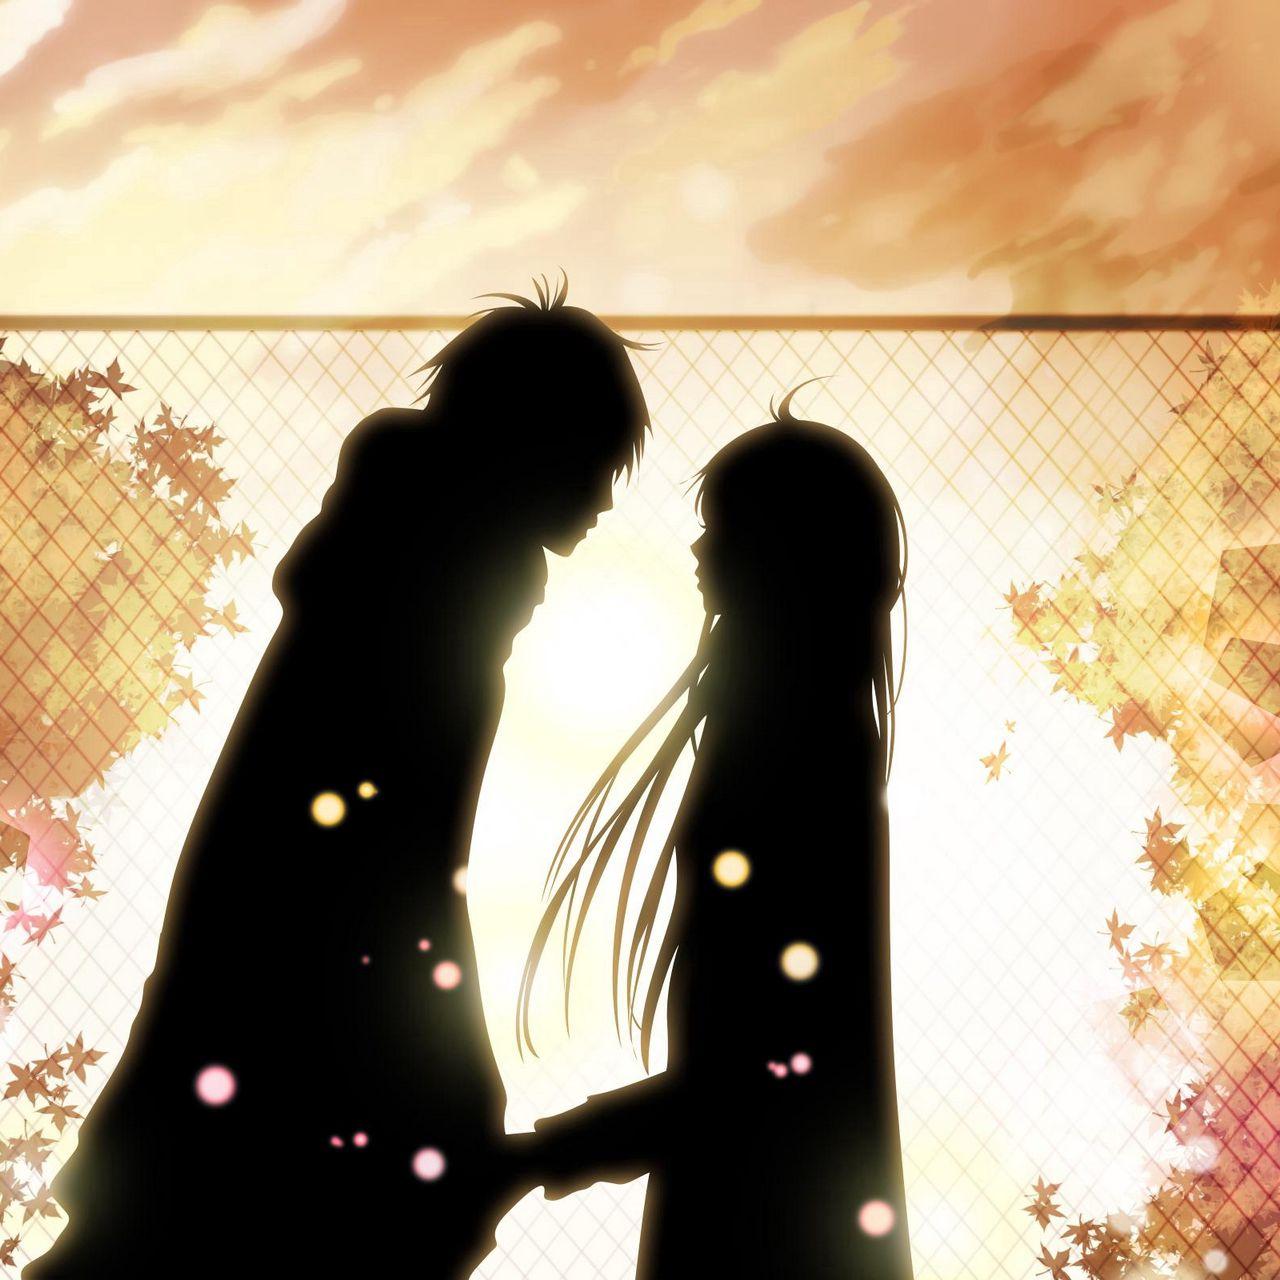 1280x1280 Wallpaper kimi ni todoke, girl, boy, love, feelings, meet, date, fall, leaves